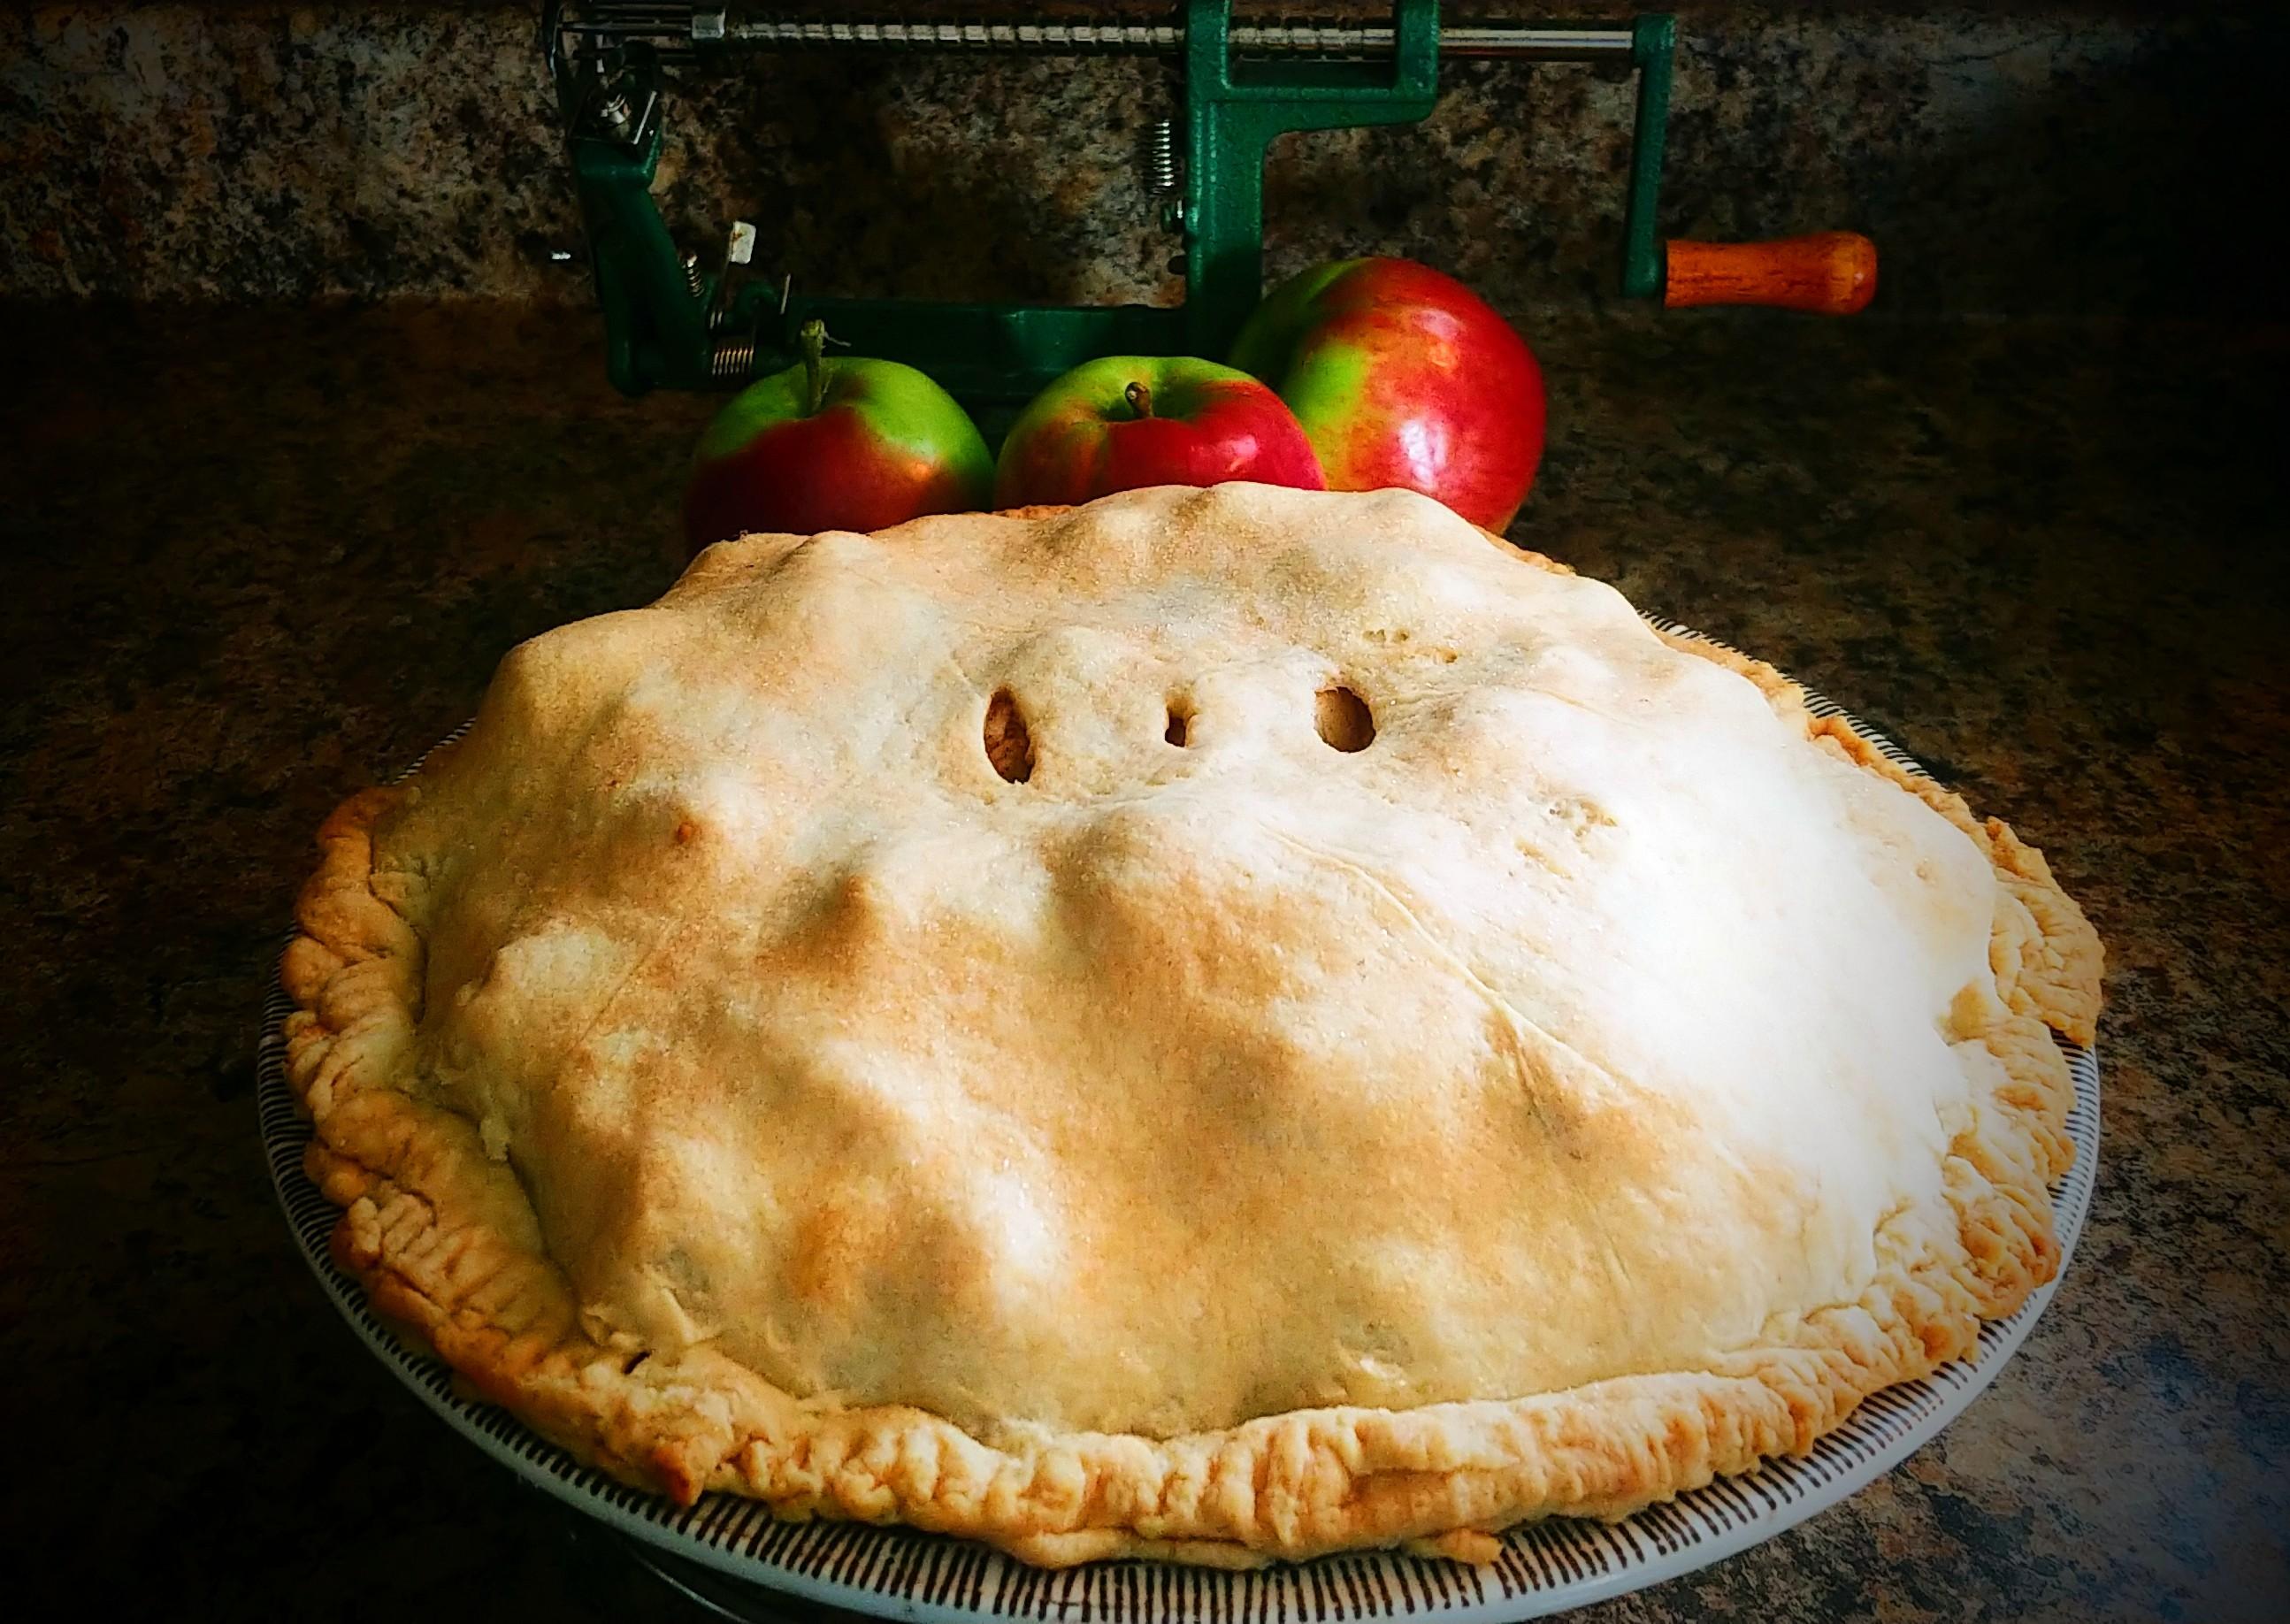 The Big Apple Pie Nathalie